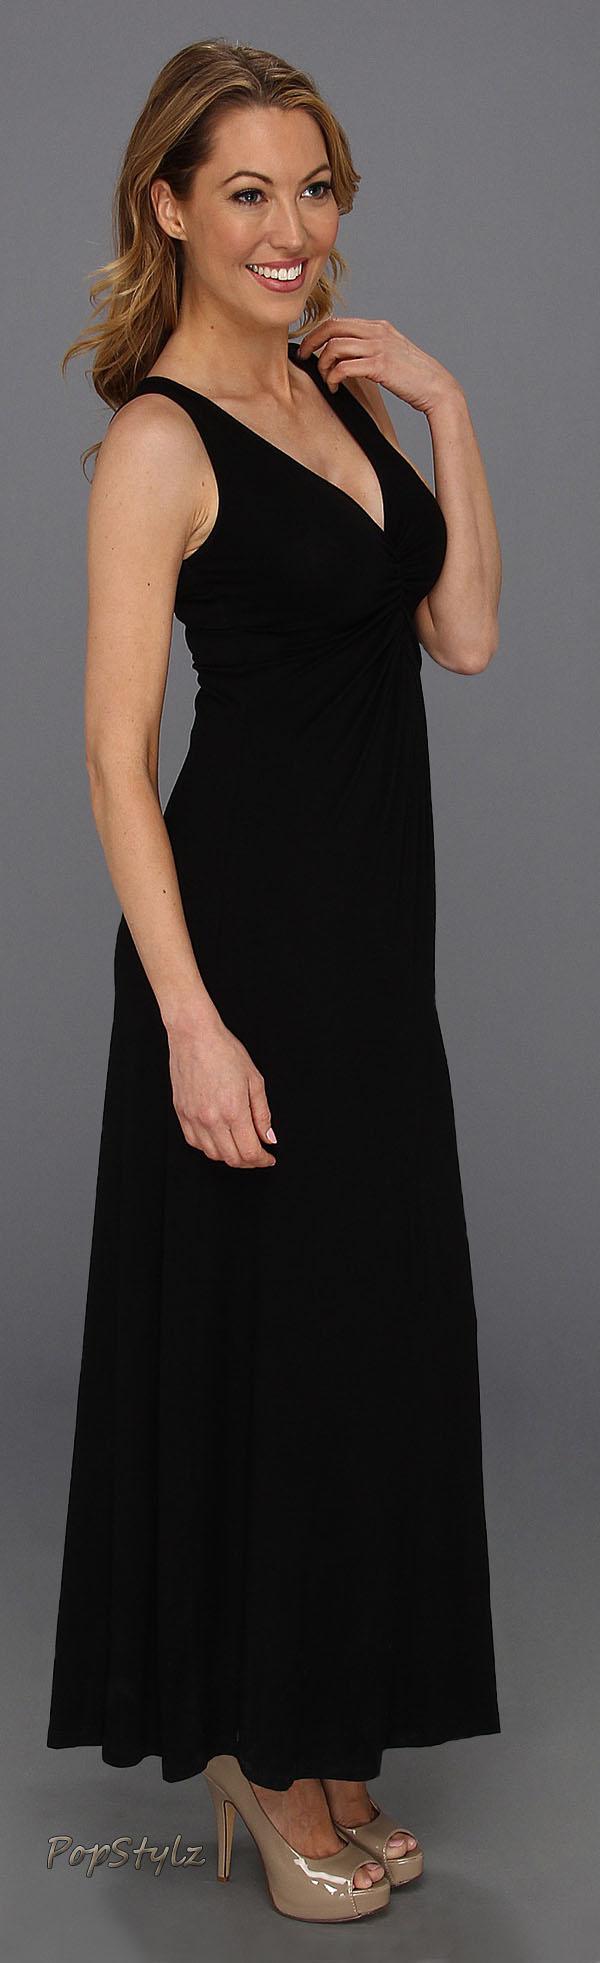 Karen Kane Sofia Maxi Dress Dresses Fashion Outfits Beautiful Maxi Dresses [ 1963 x 600 Pixel ]